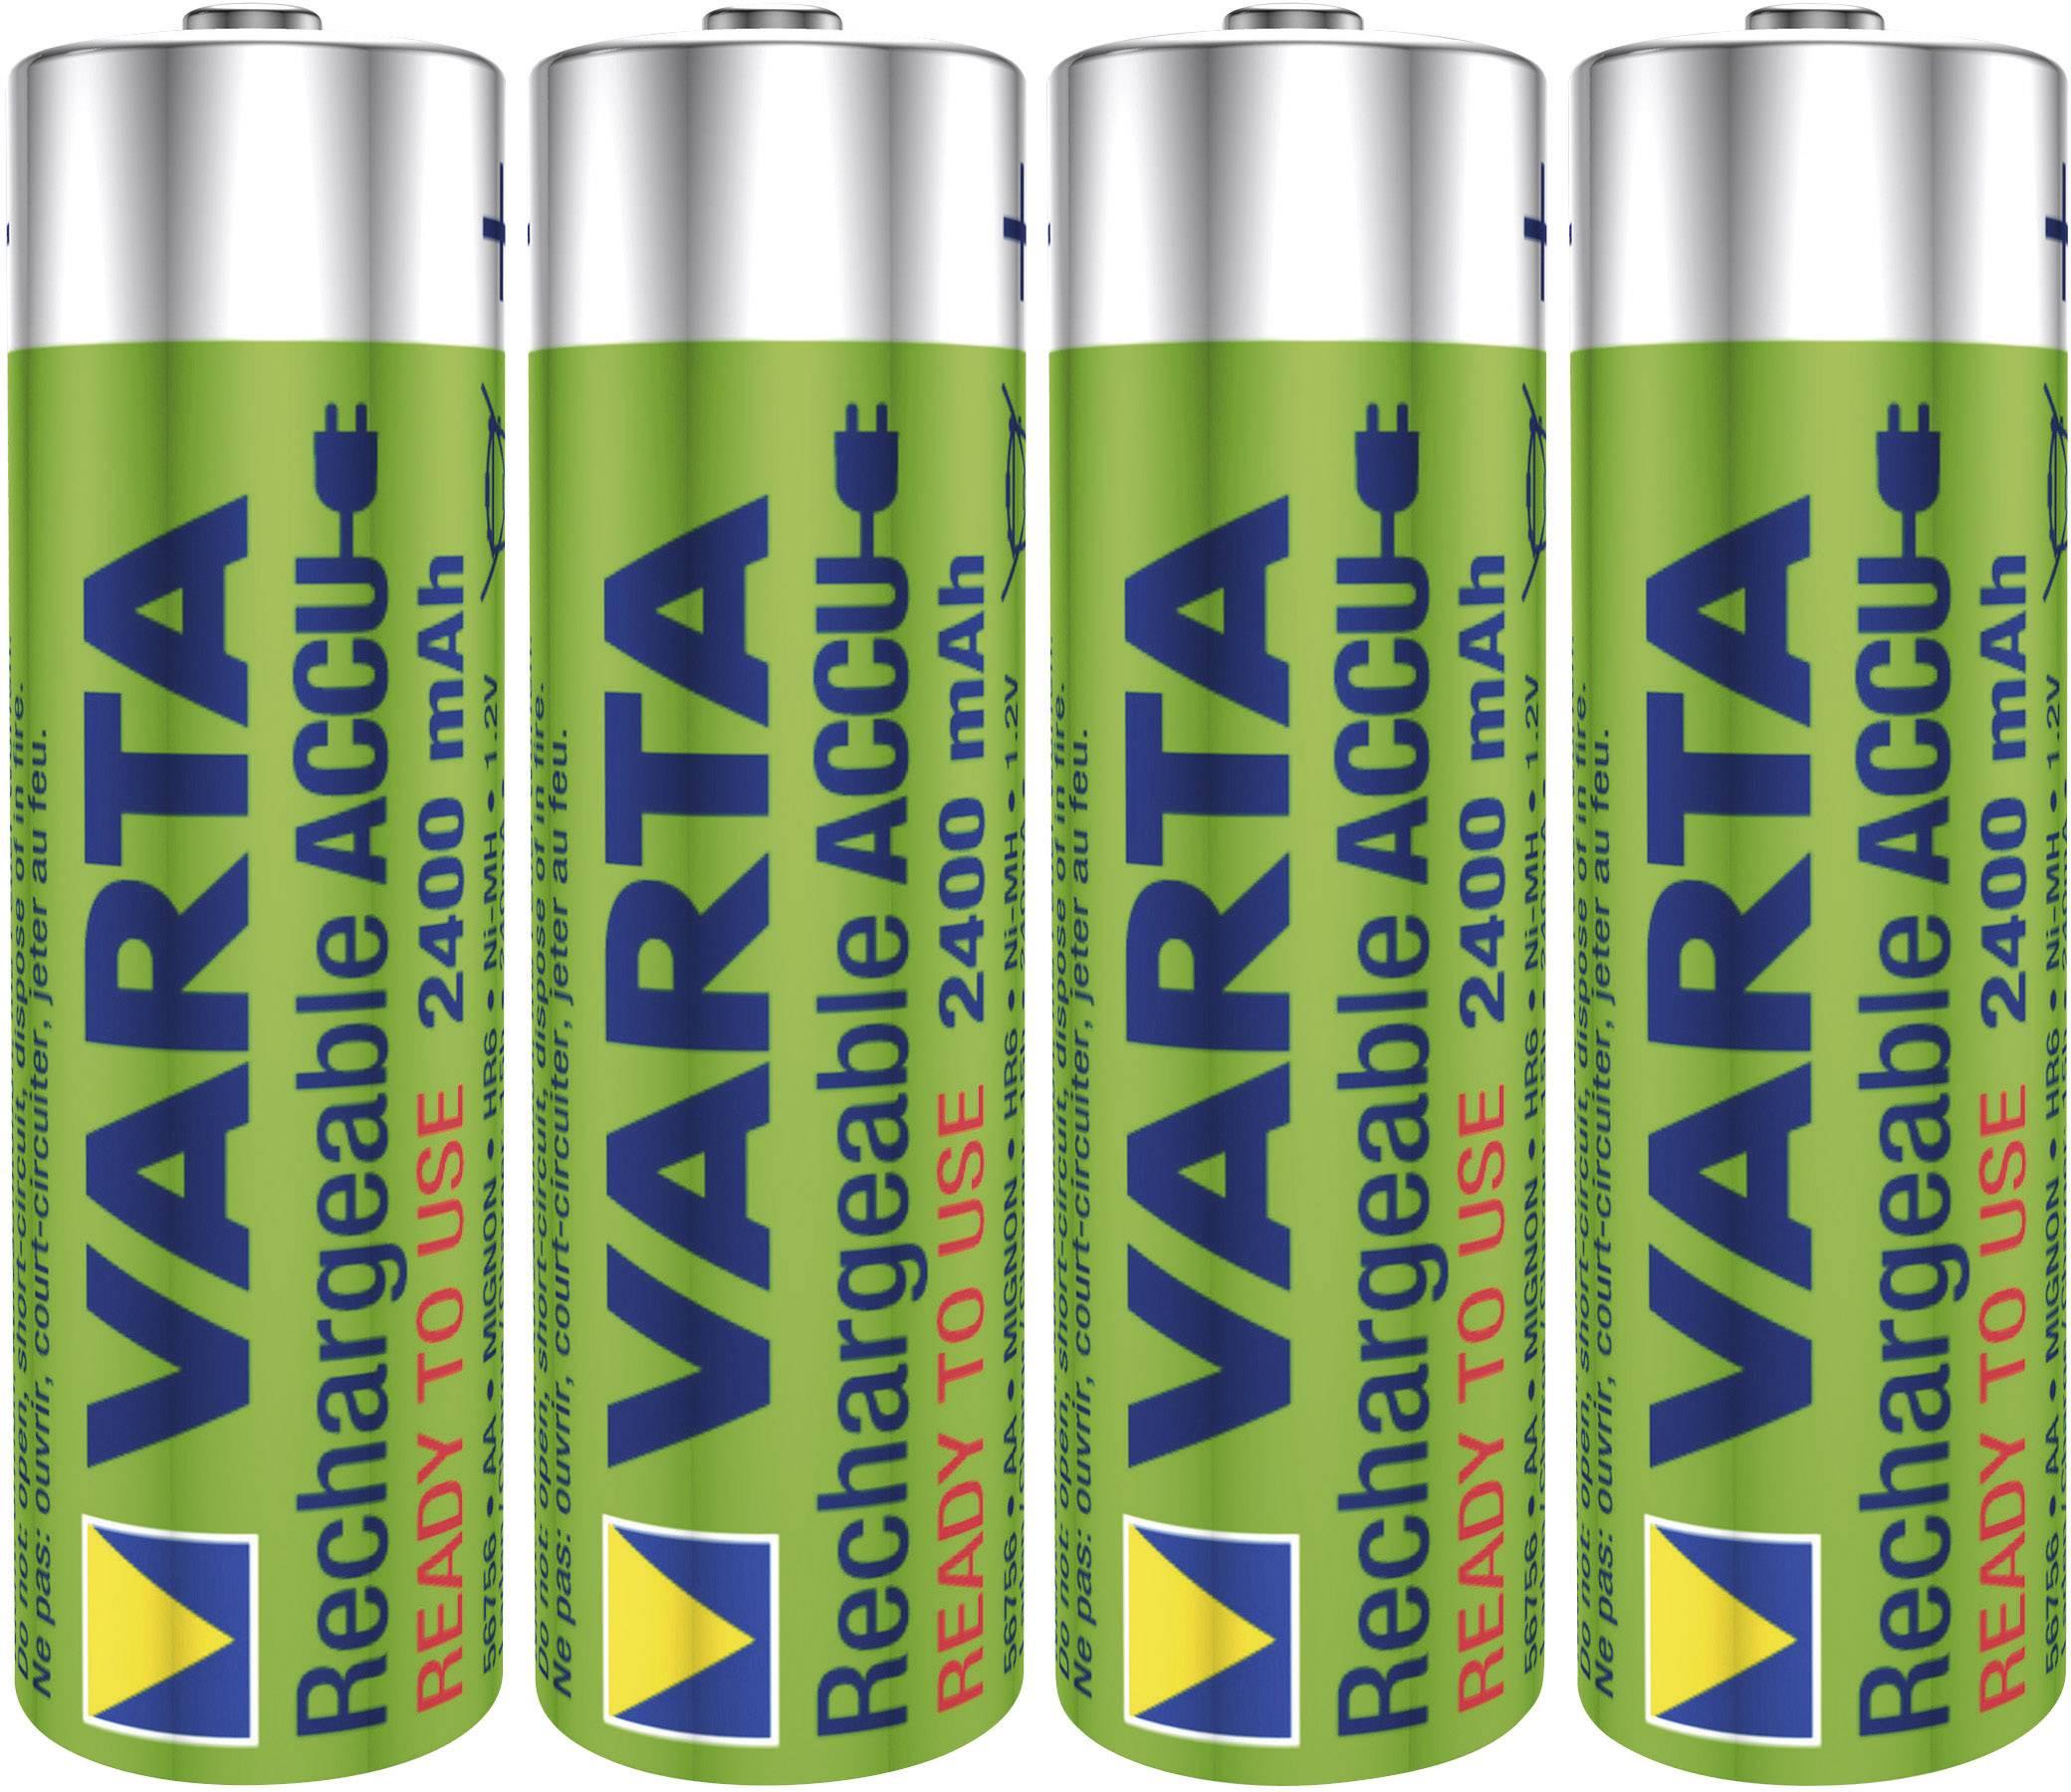 Tužkový akumulátor typu AA NiMH Varta Ready2Use HR06 56756101404, 2400 mAh, 1.2 V, 4 ks